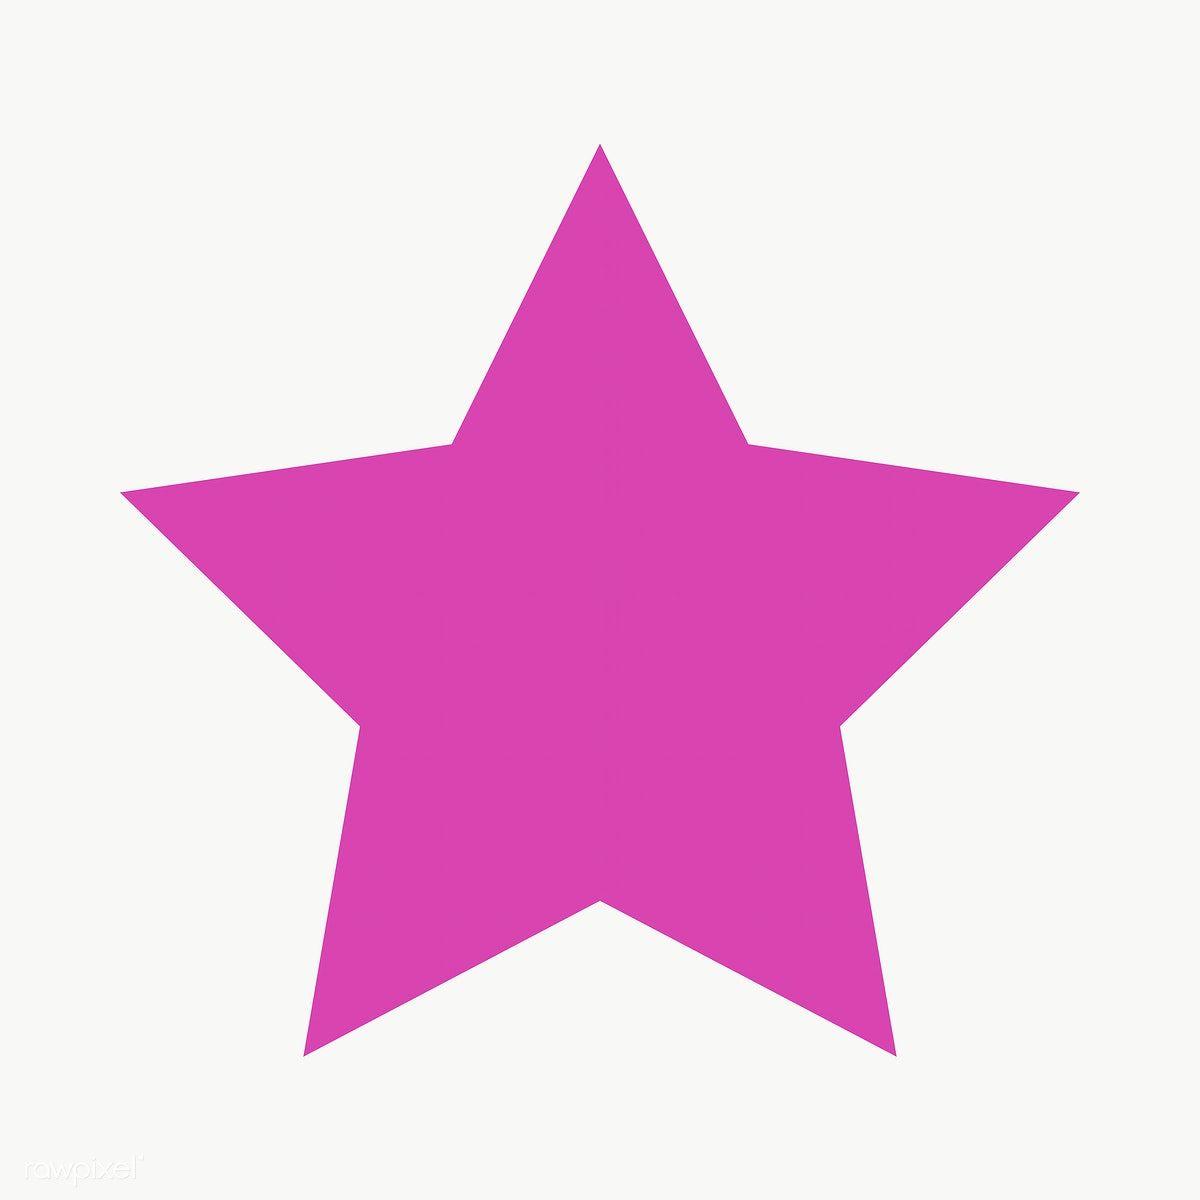 Pink Star Geometric Shape Transparent Png Free Image By Rawpixel Com Ningzk V Geometric Star Geometric Shapes Pink Stars